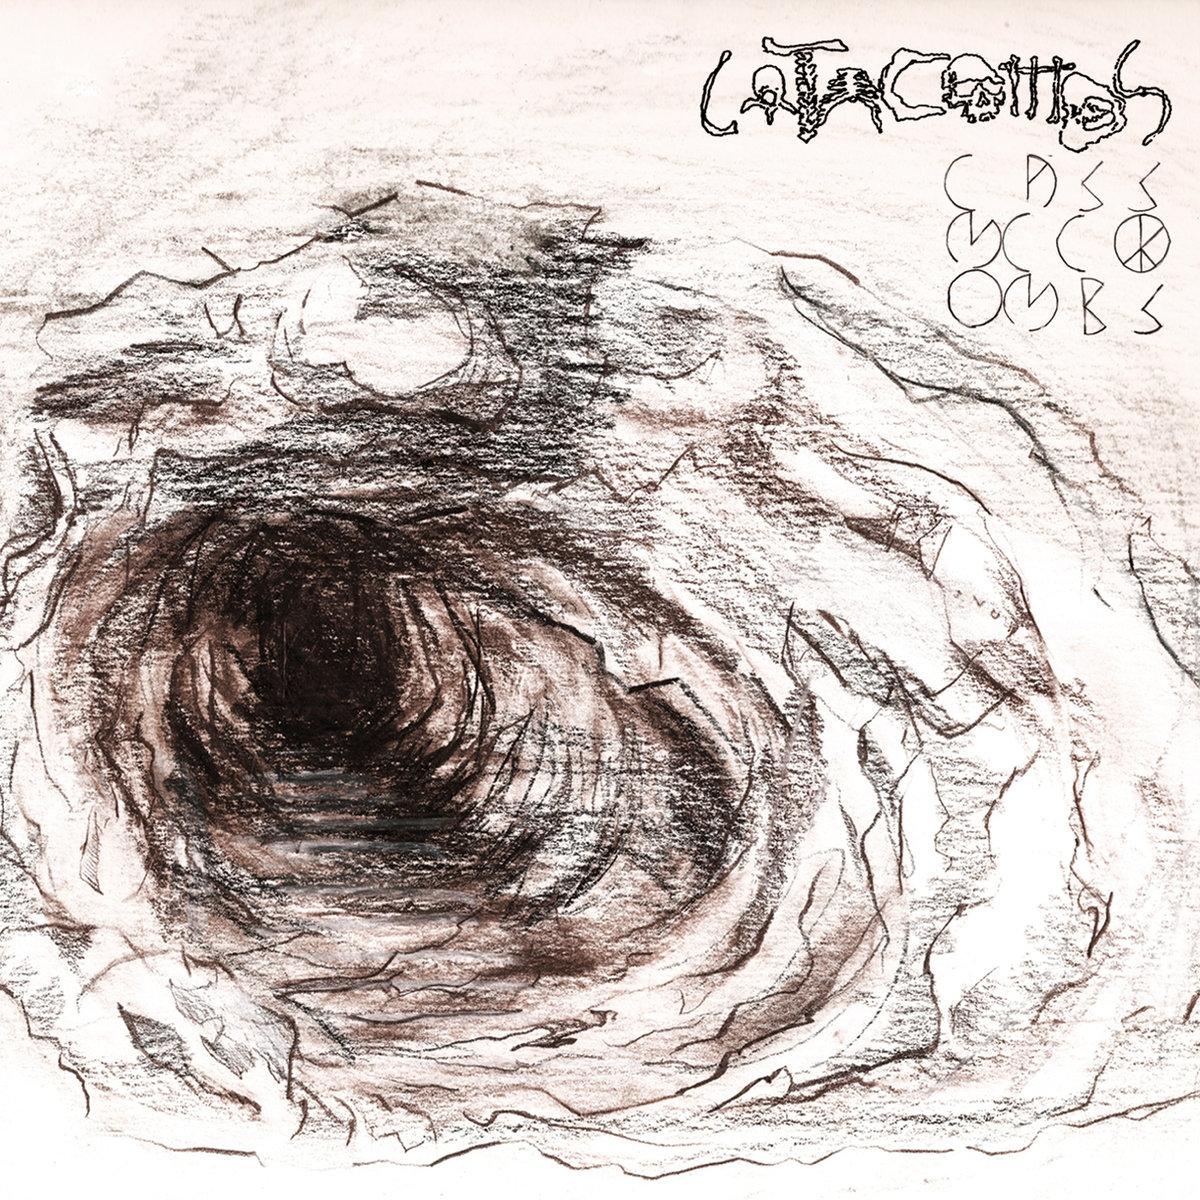 cass-mccombs-catacombs.png